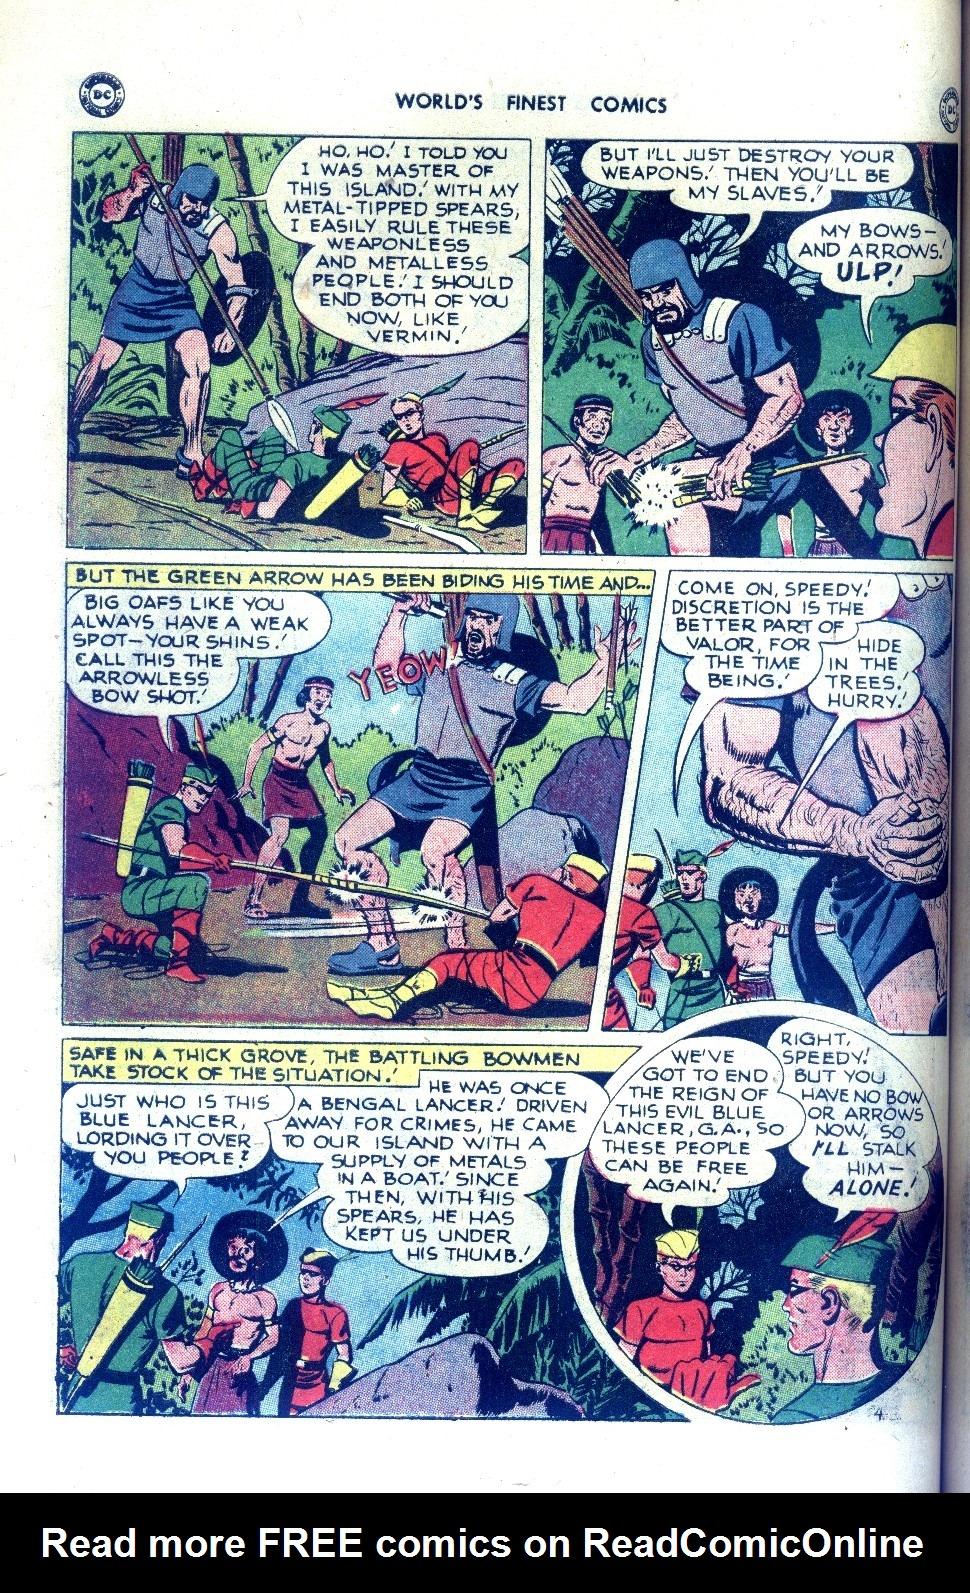 Read online World's Finest Comics comic -  Issue #43 - 44